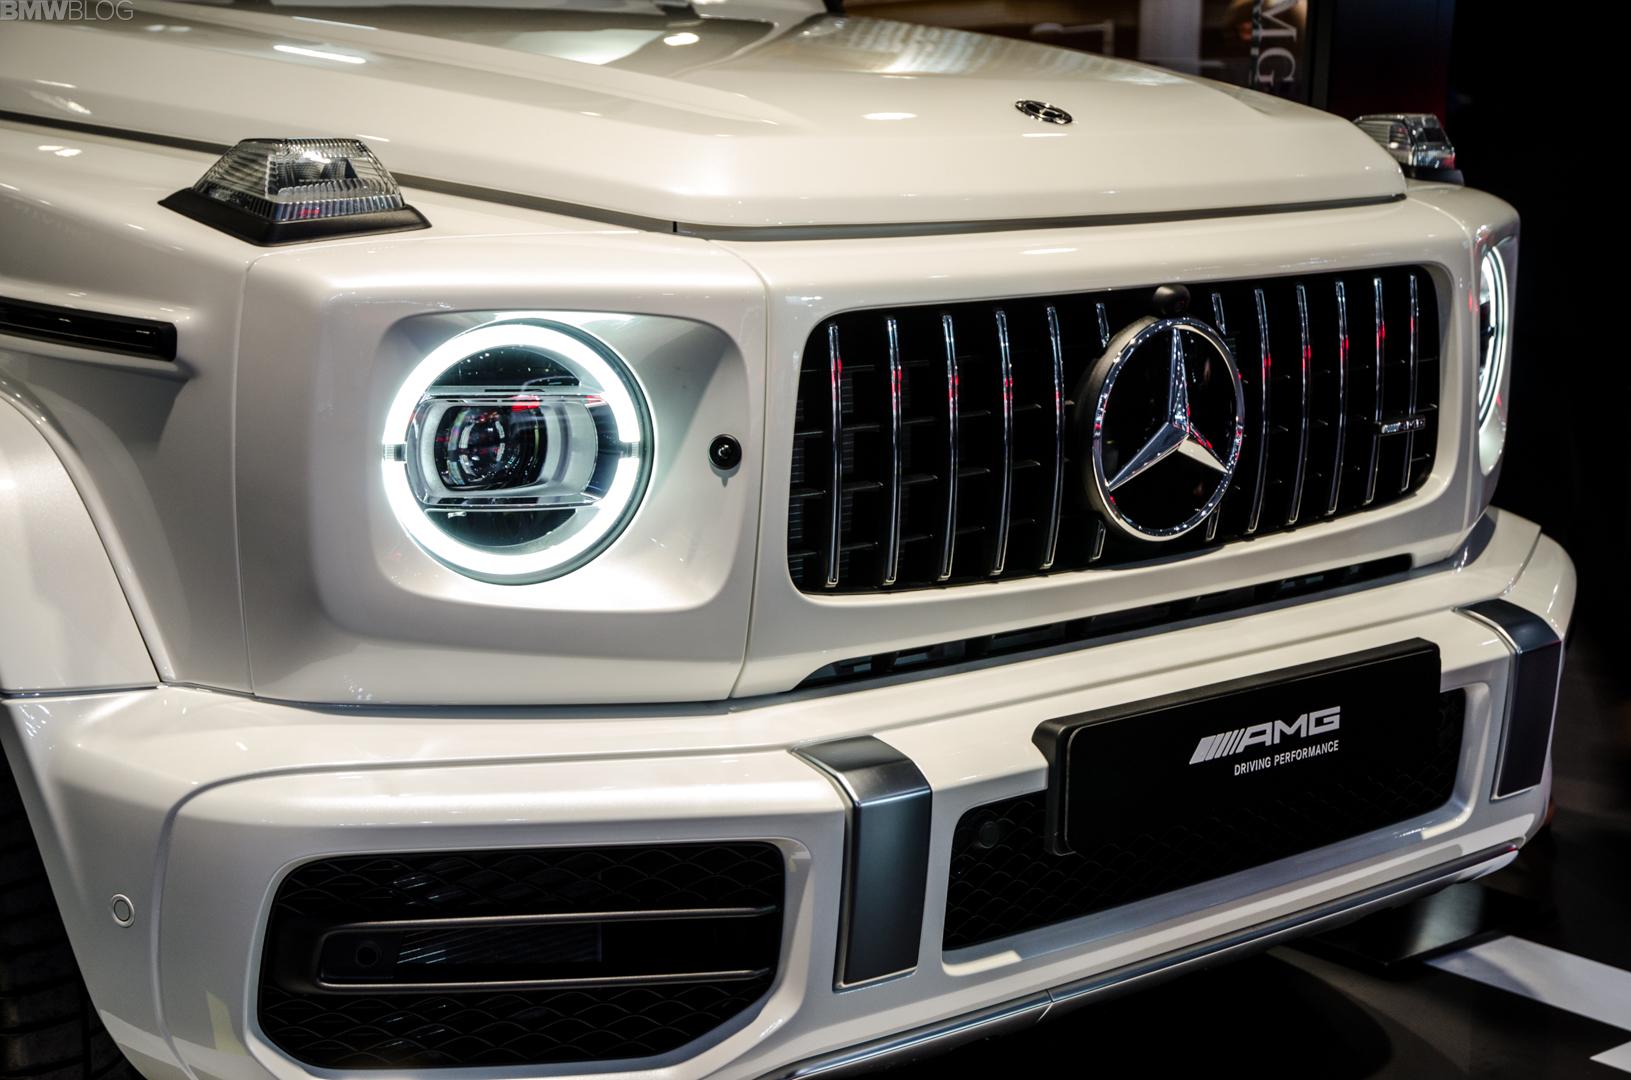 2018 Nyias Mercedes Amg G63